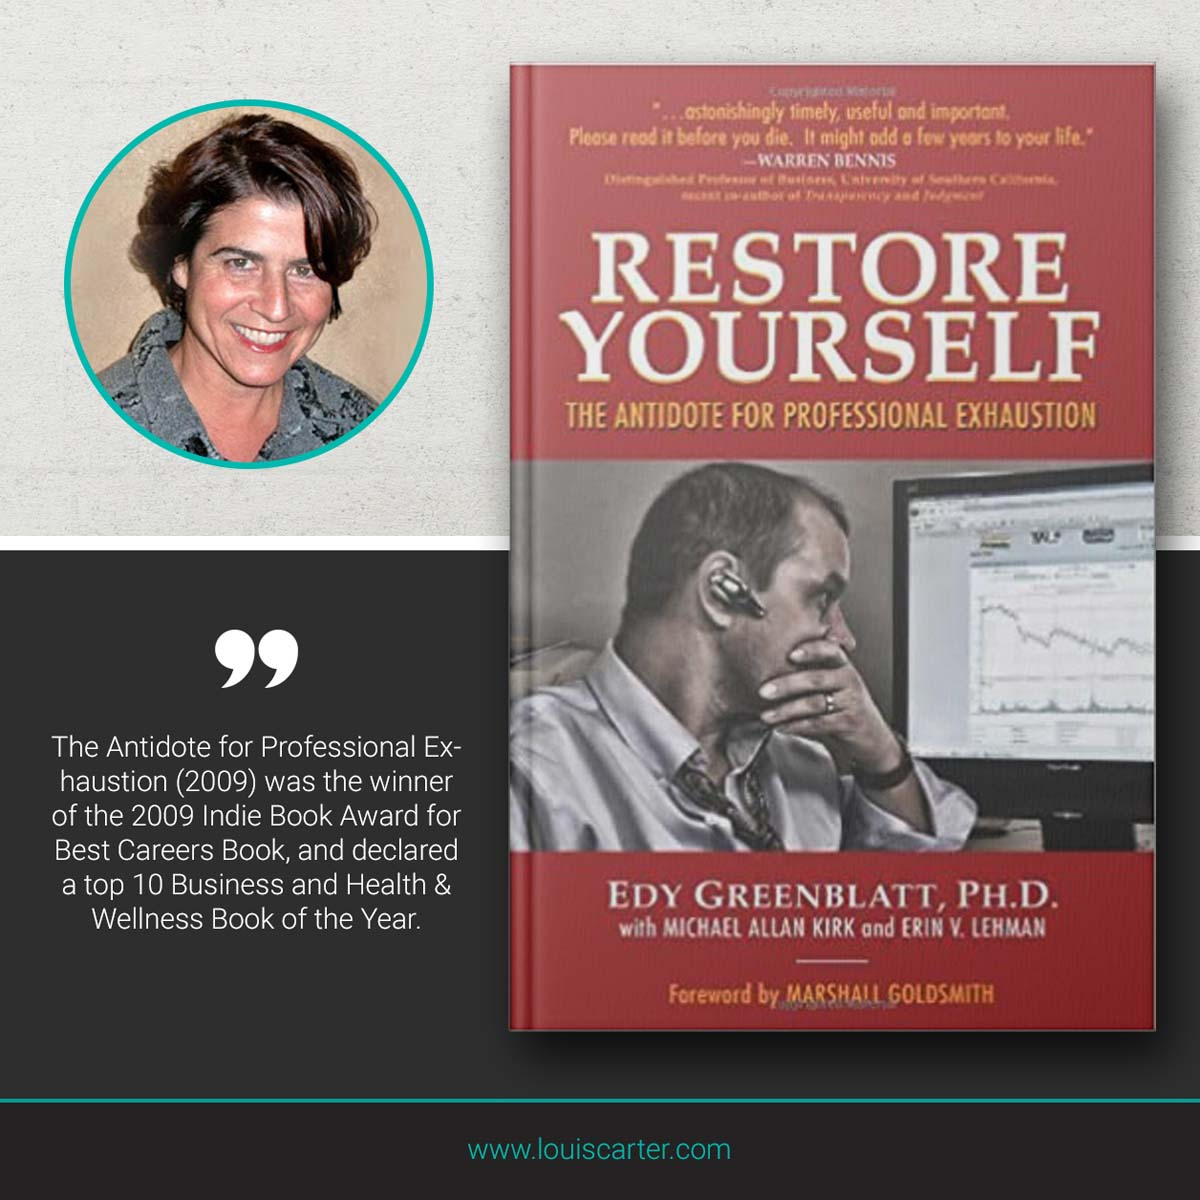 Image of Leadership book Restore Yourself by Edy Greenblatt.